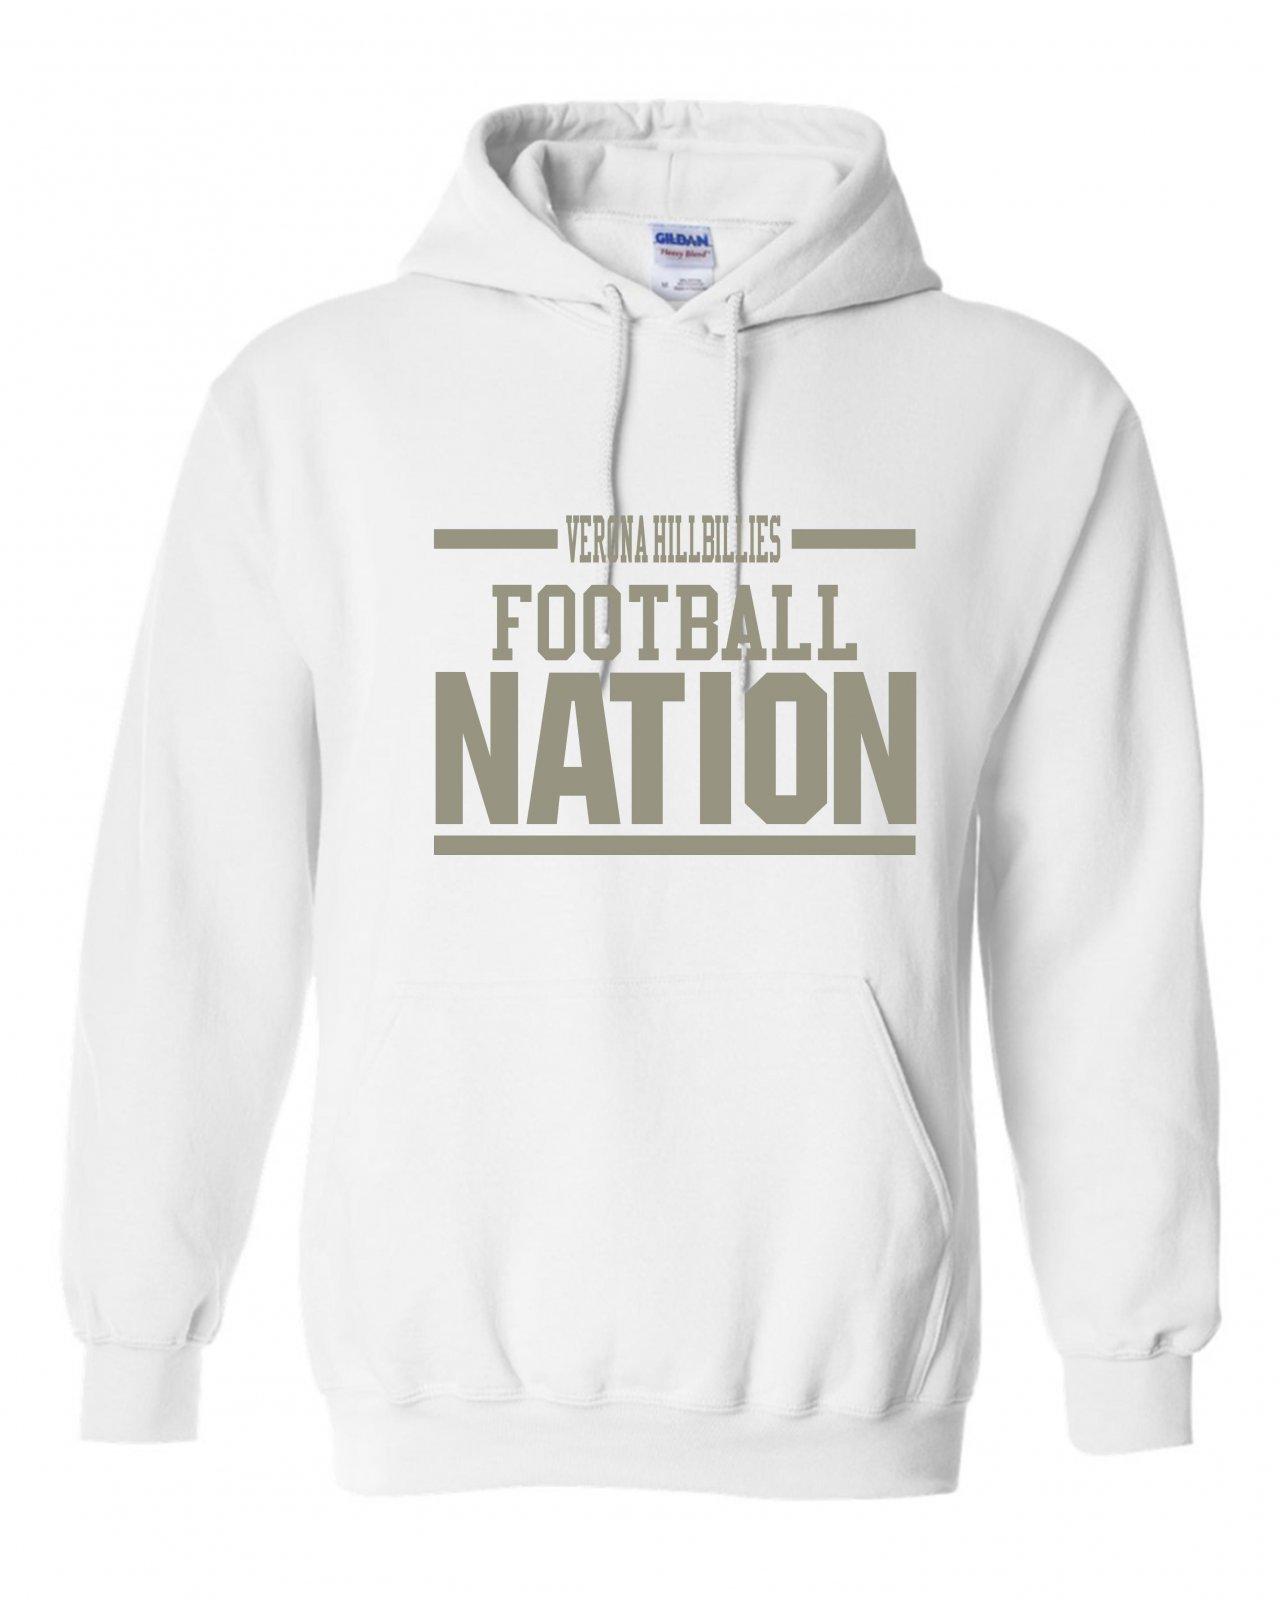 Gildan Verona Hillbillies Football Nation Hoodie